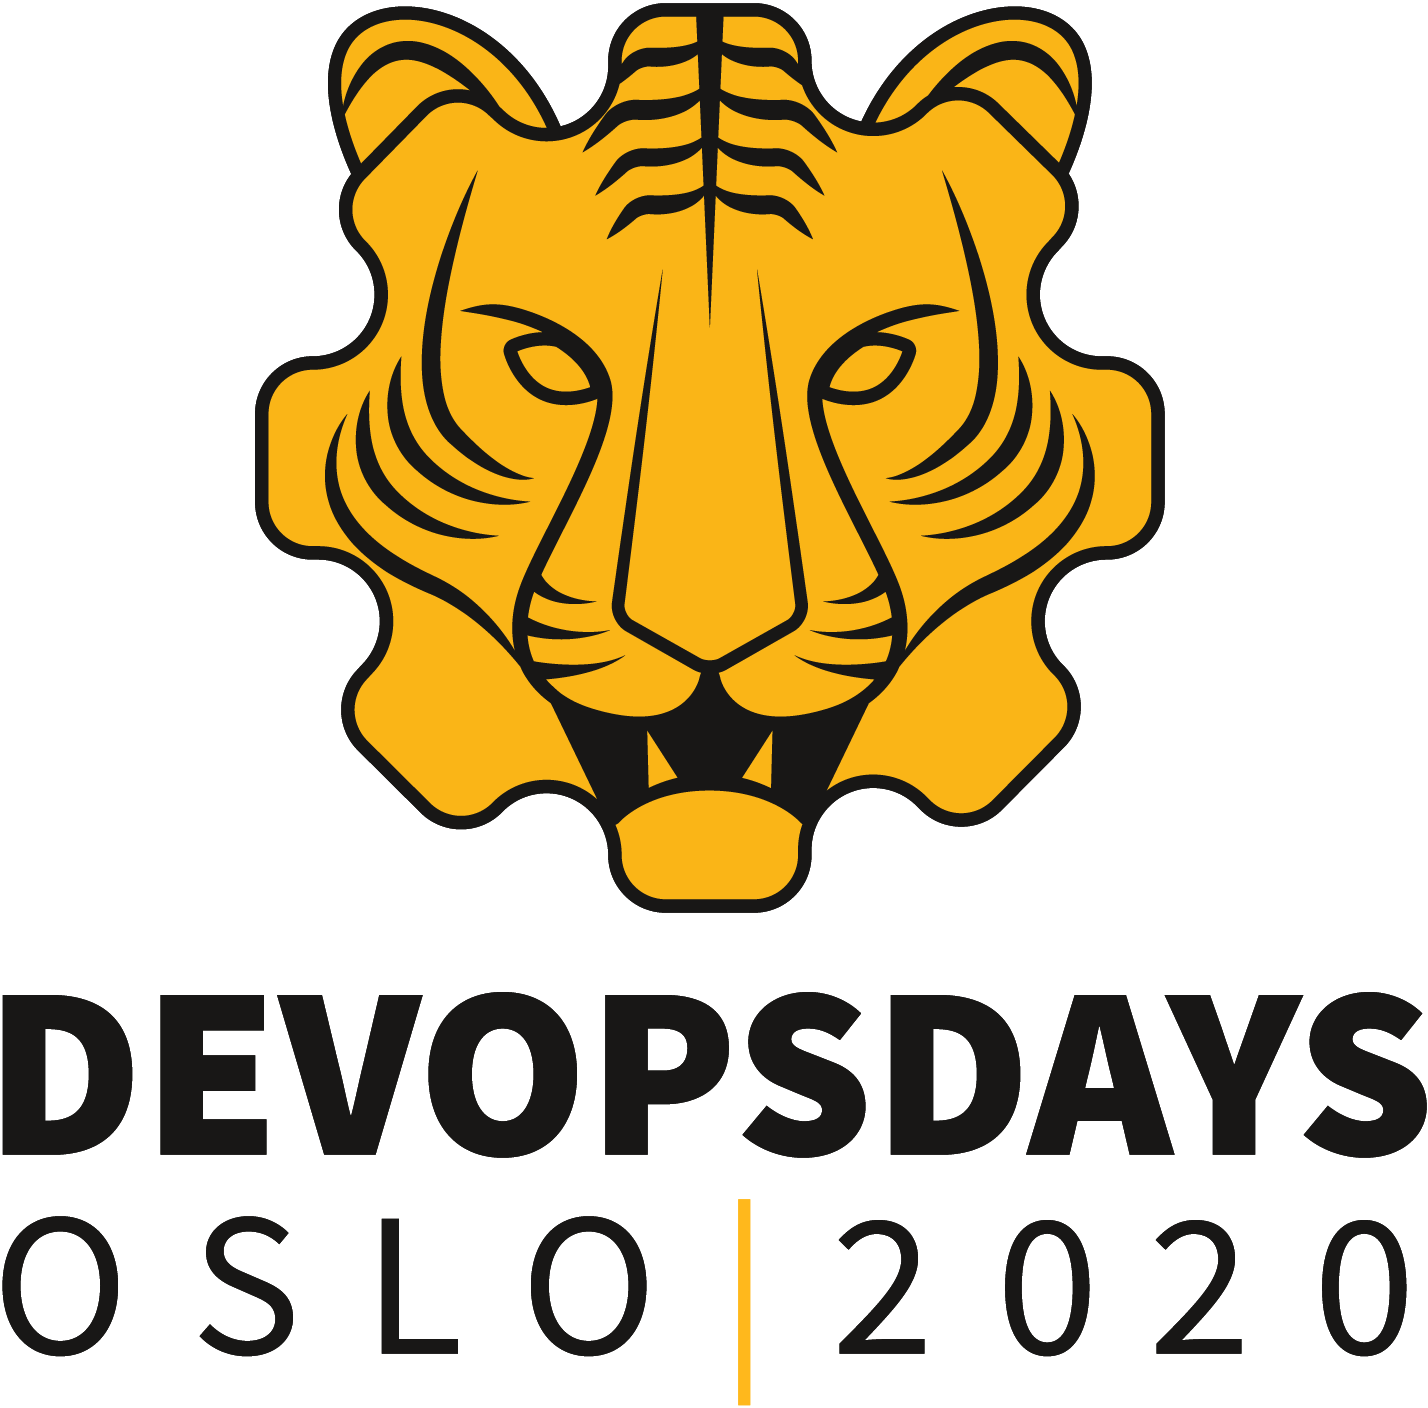 DevOpsDays Oslo 2020